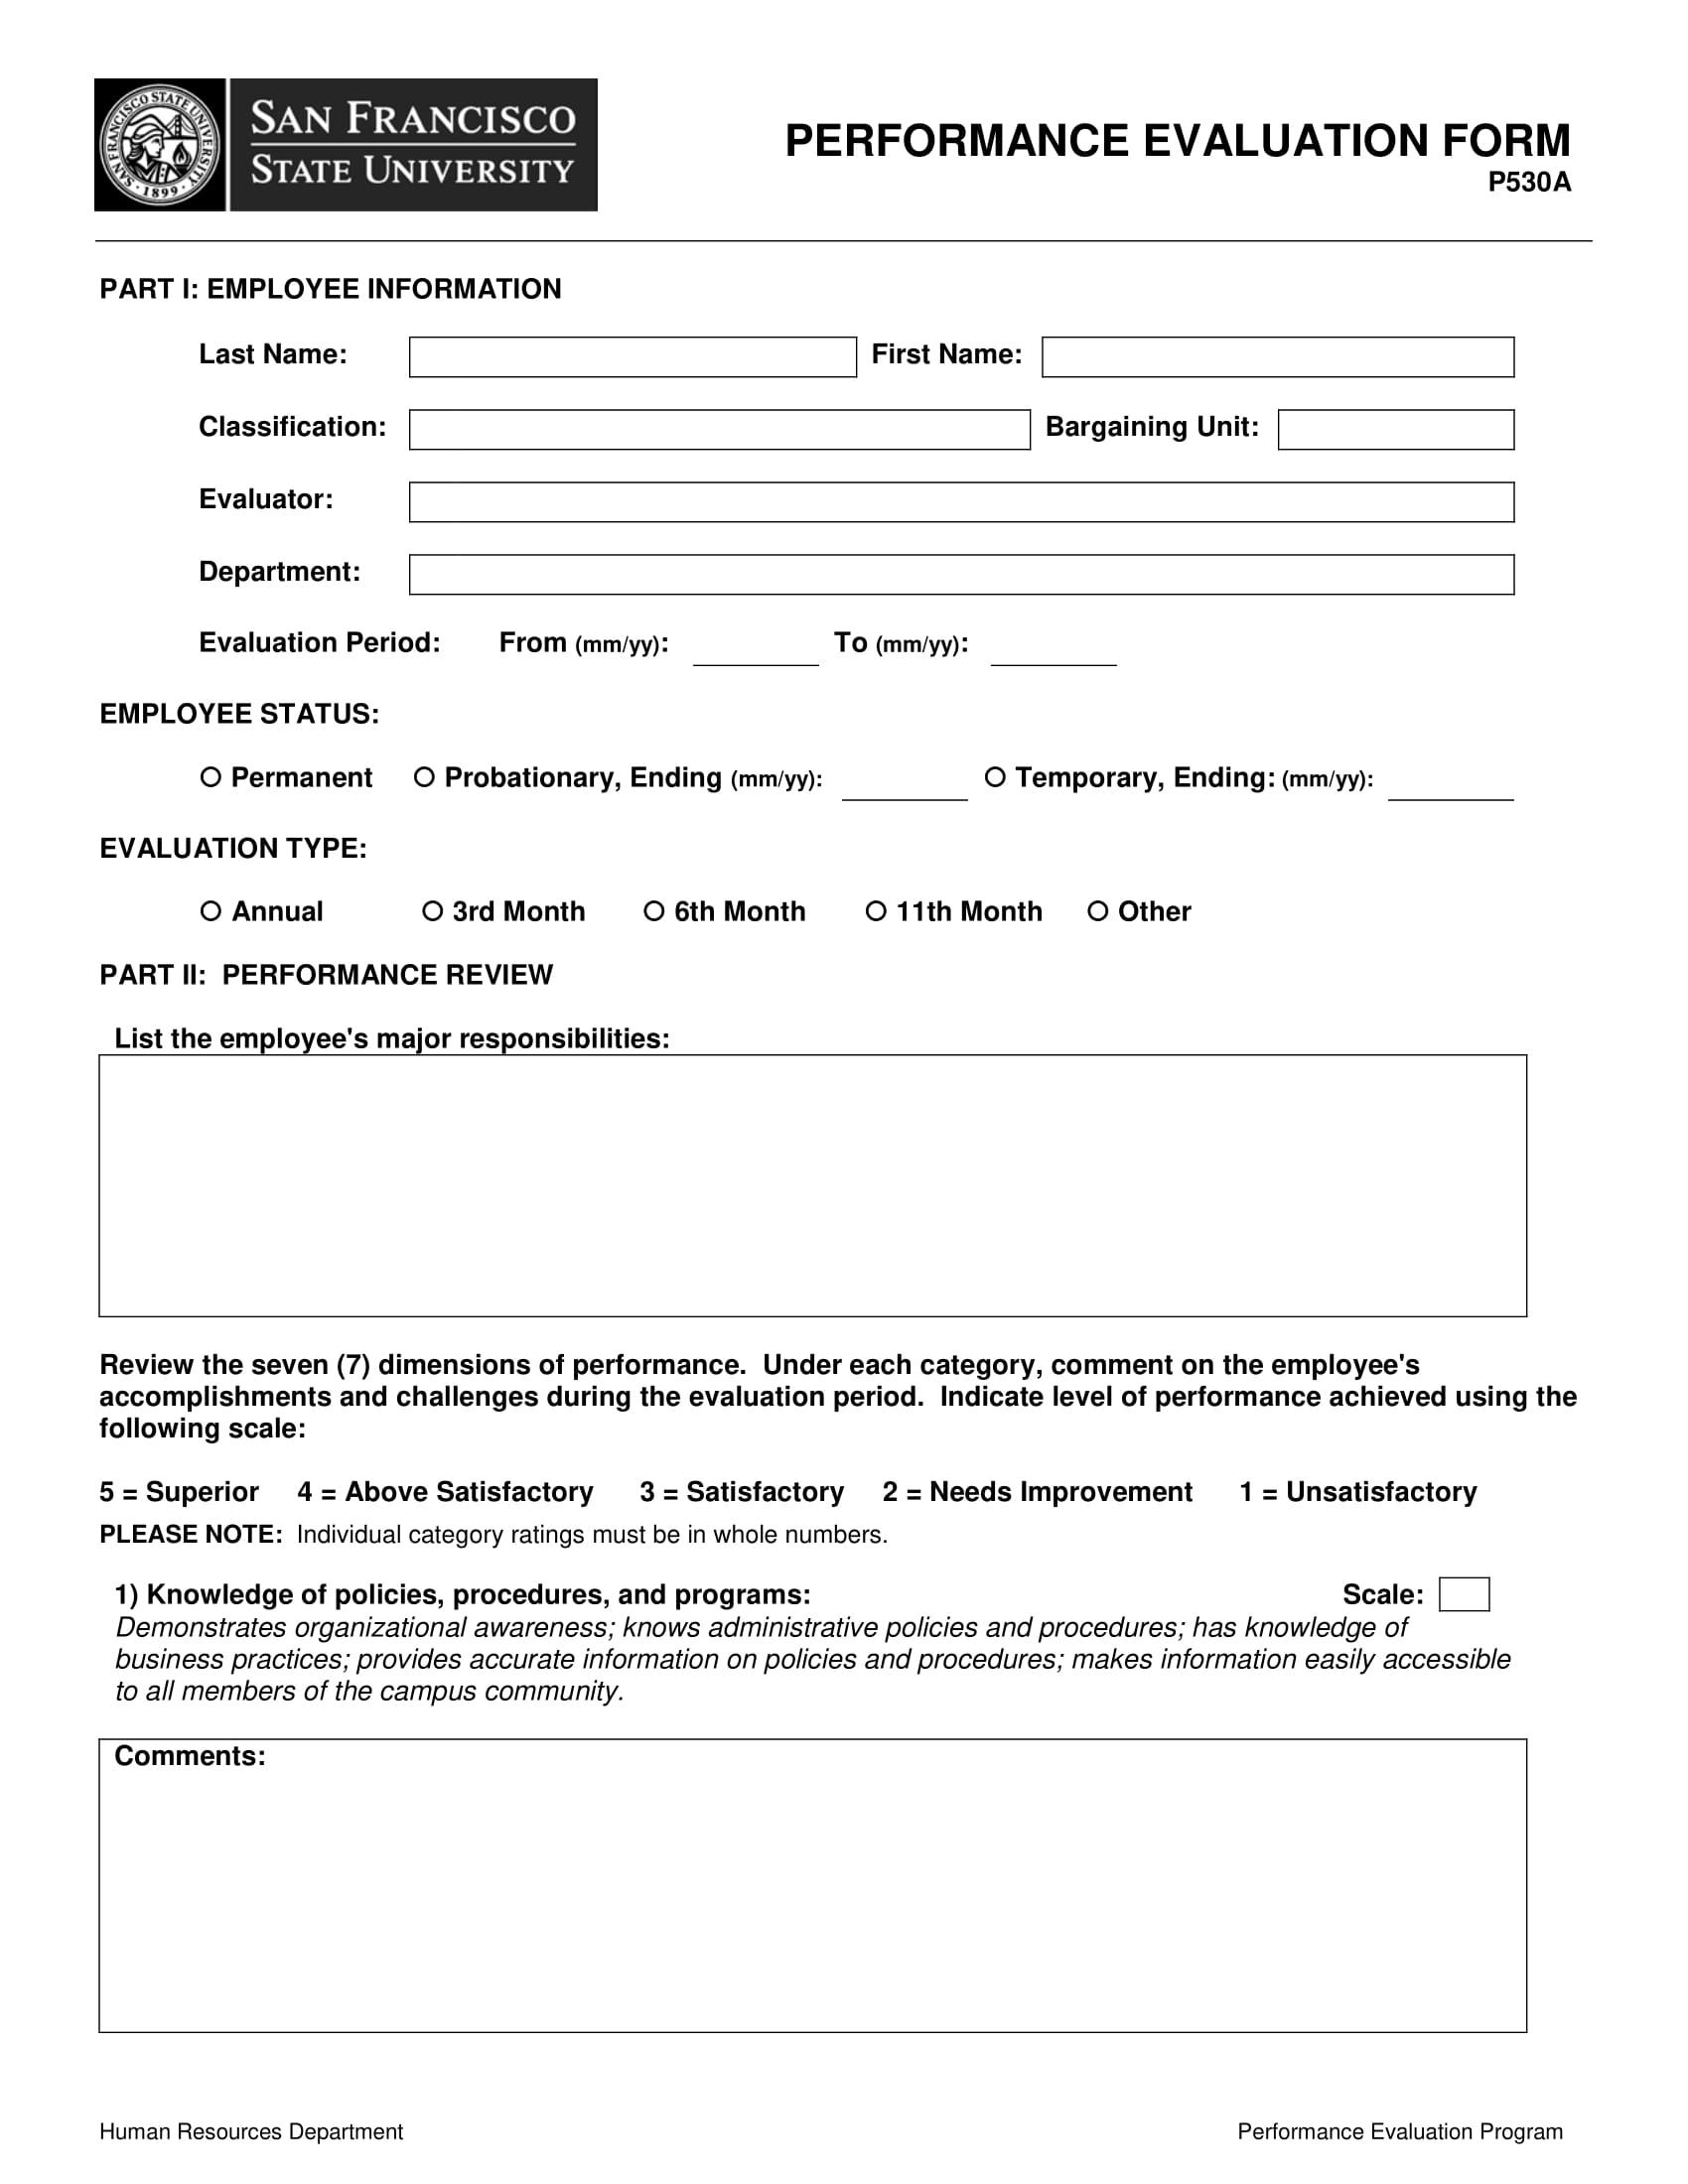 Sample Employee Evaluation Form | Sample Employee Performance Evaluation Form Leon Seattlebaby Co